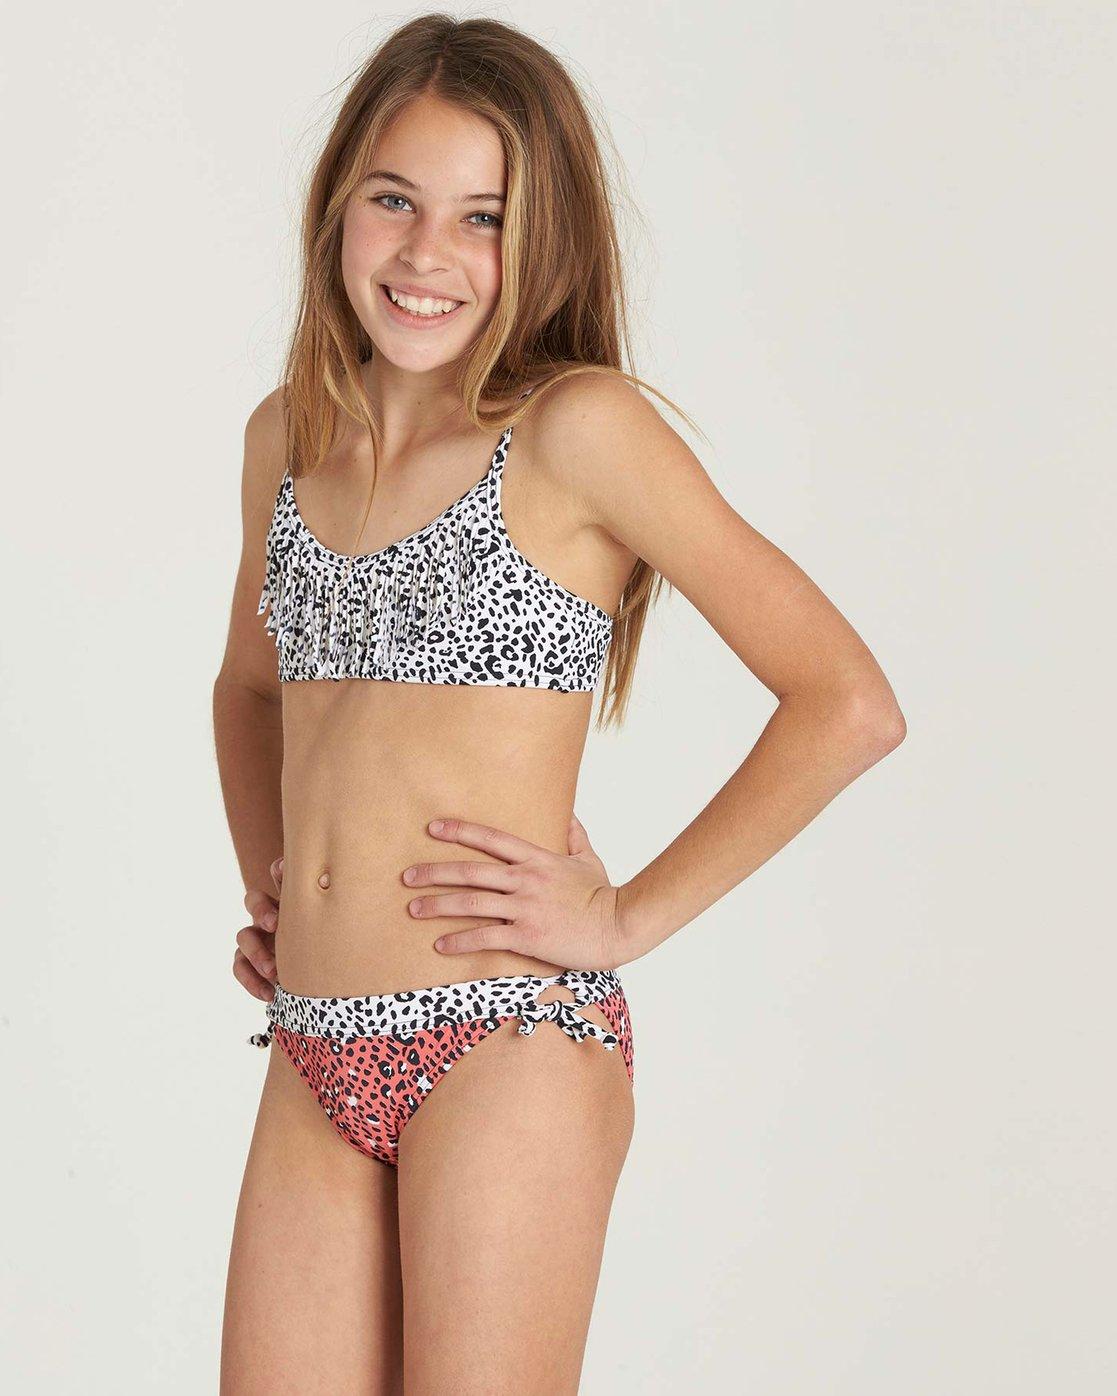 Billabong Girls Girls Wild Roar Tali Swim Set